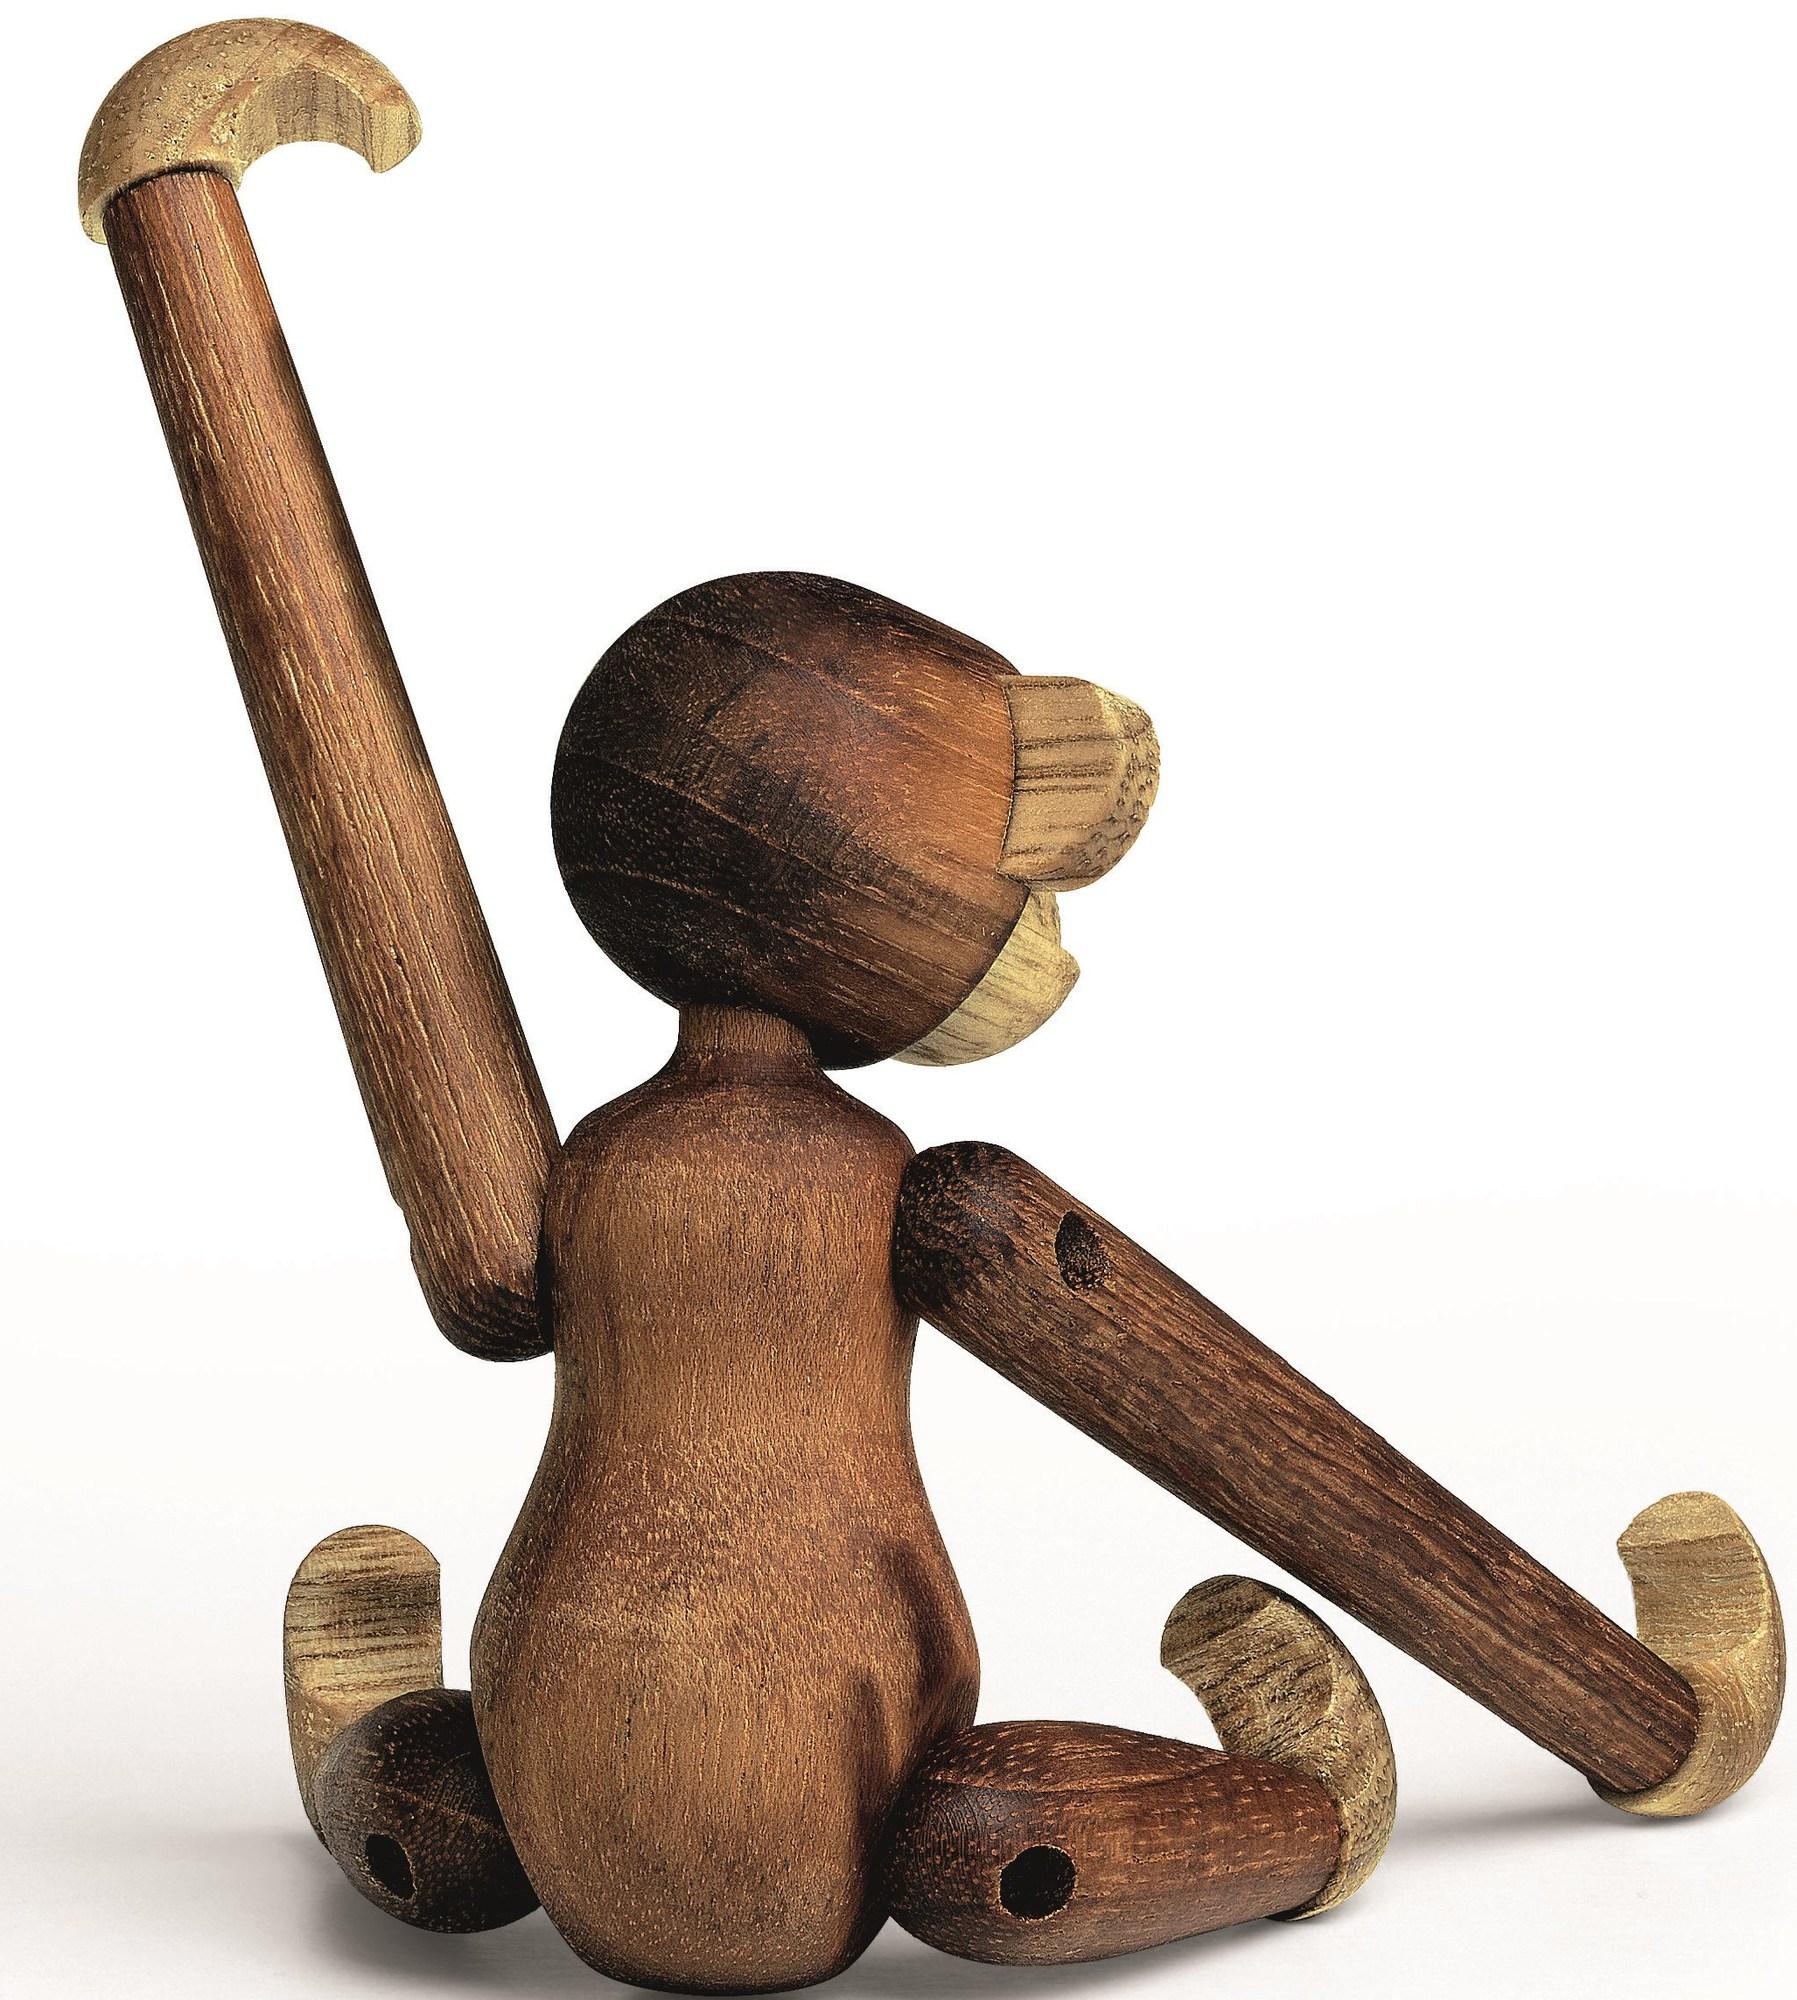 Affe mini Holzfigur Teak Kay Bojesen